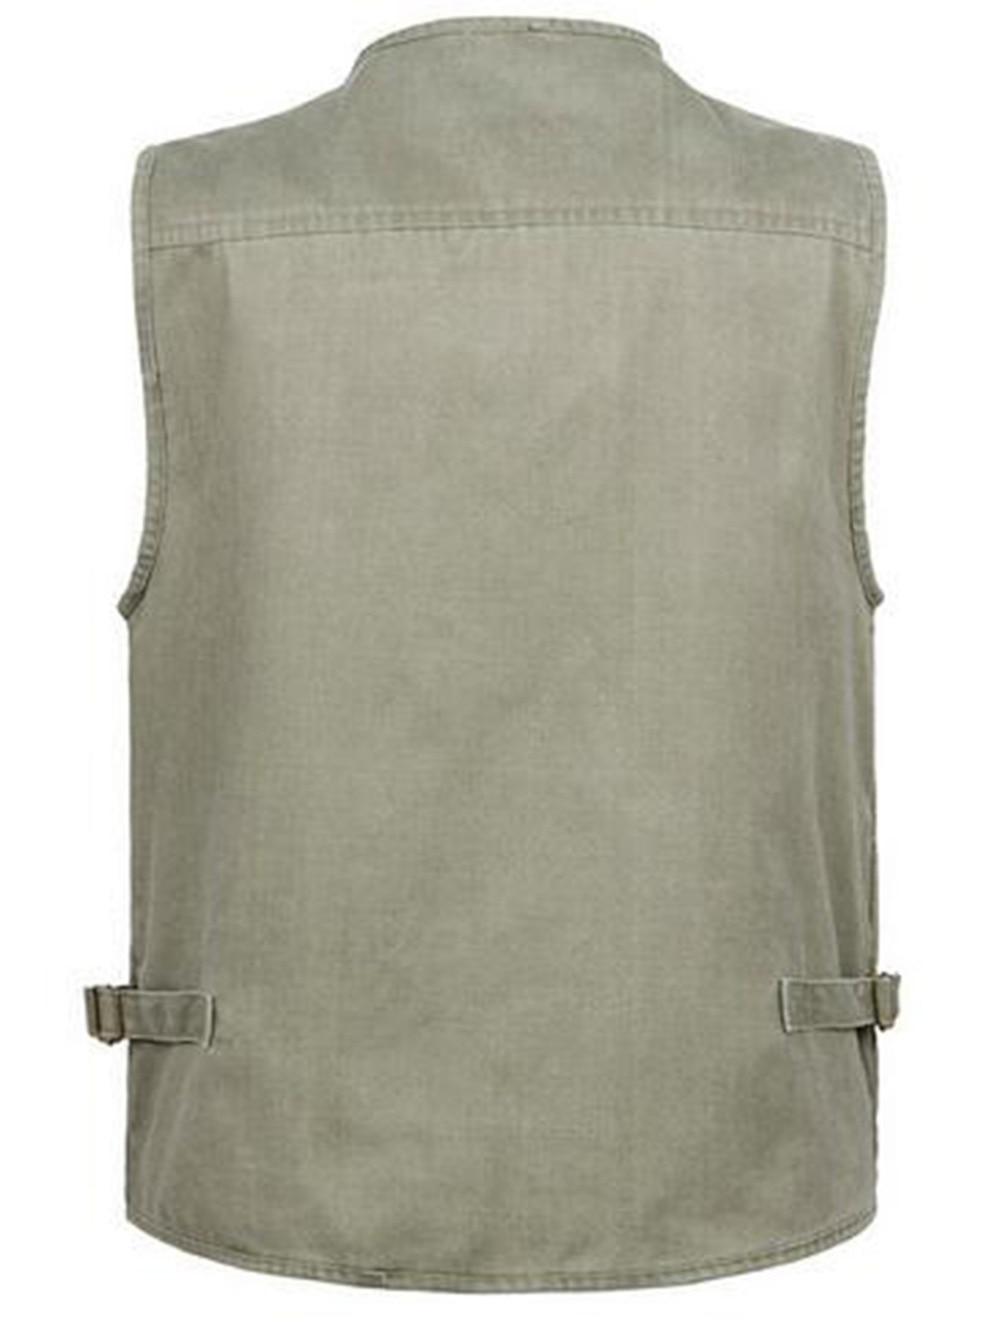 873e1c5eca4e4 Men s Denim Vest Jean Sleeveless Jacket Waistcoat Plus Size With Many  Pockets For Tactical Hunting Photography Fishing Vest